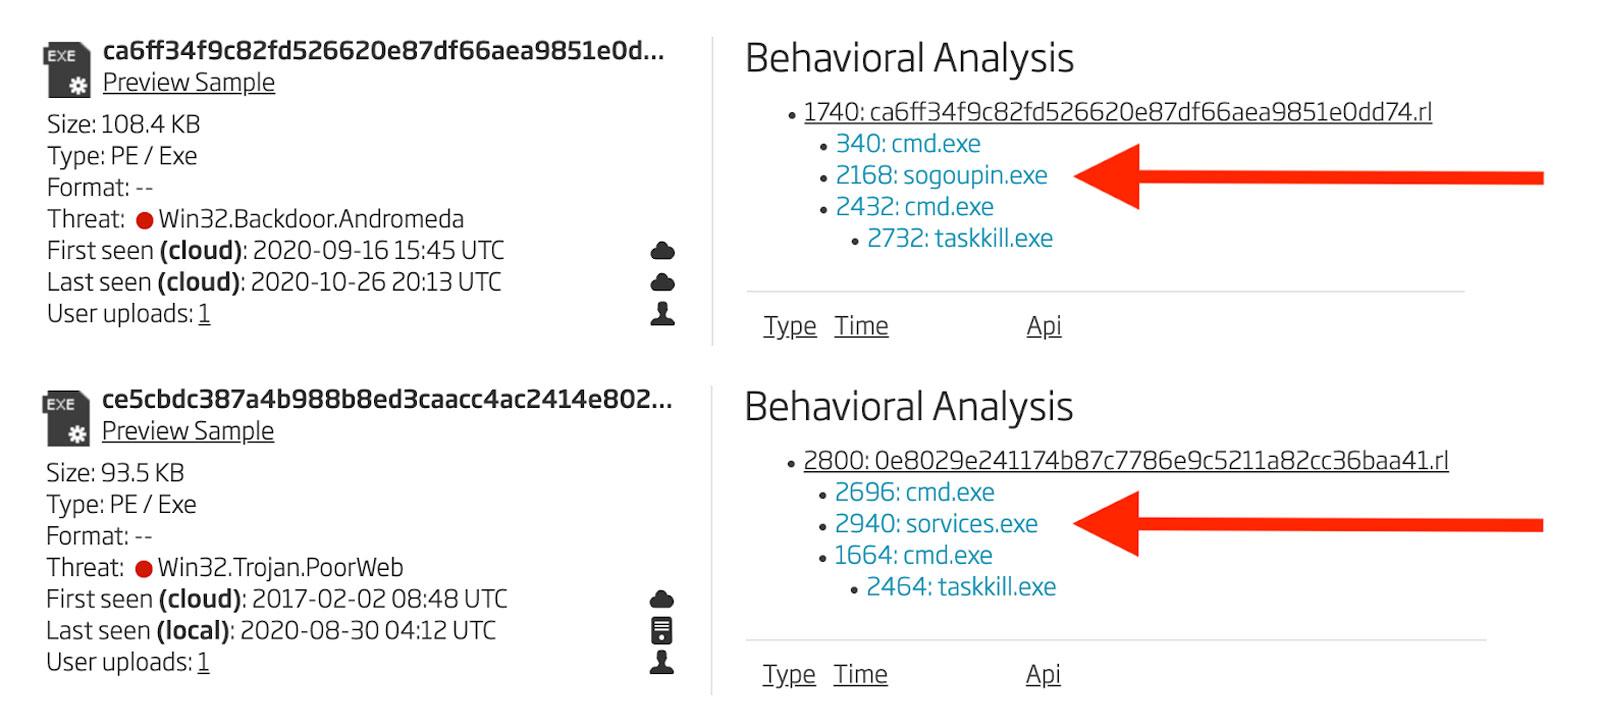 Behavioral Analyses